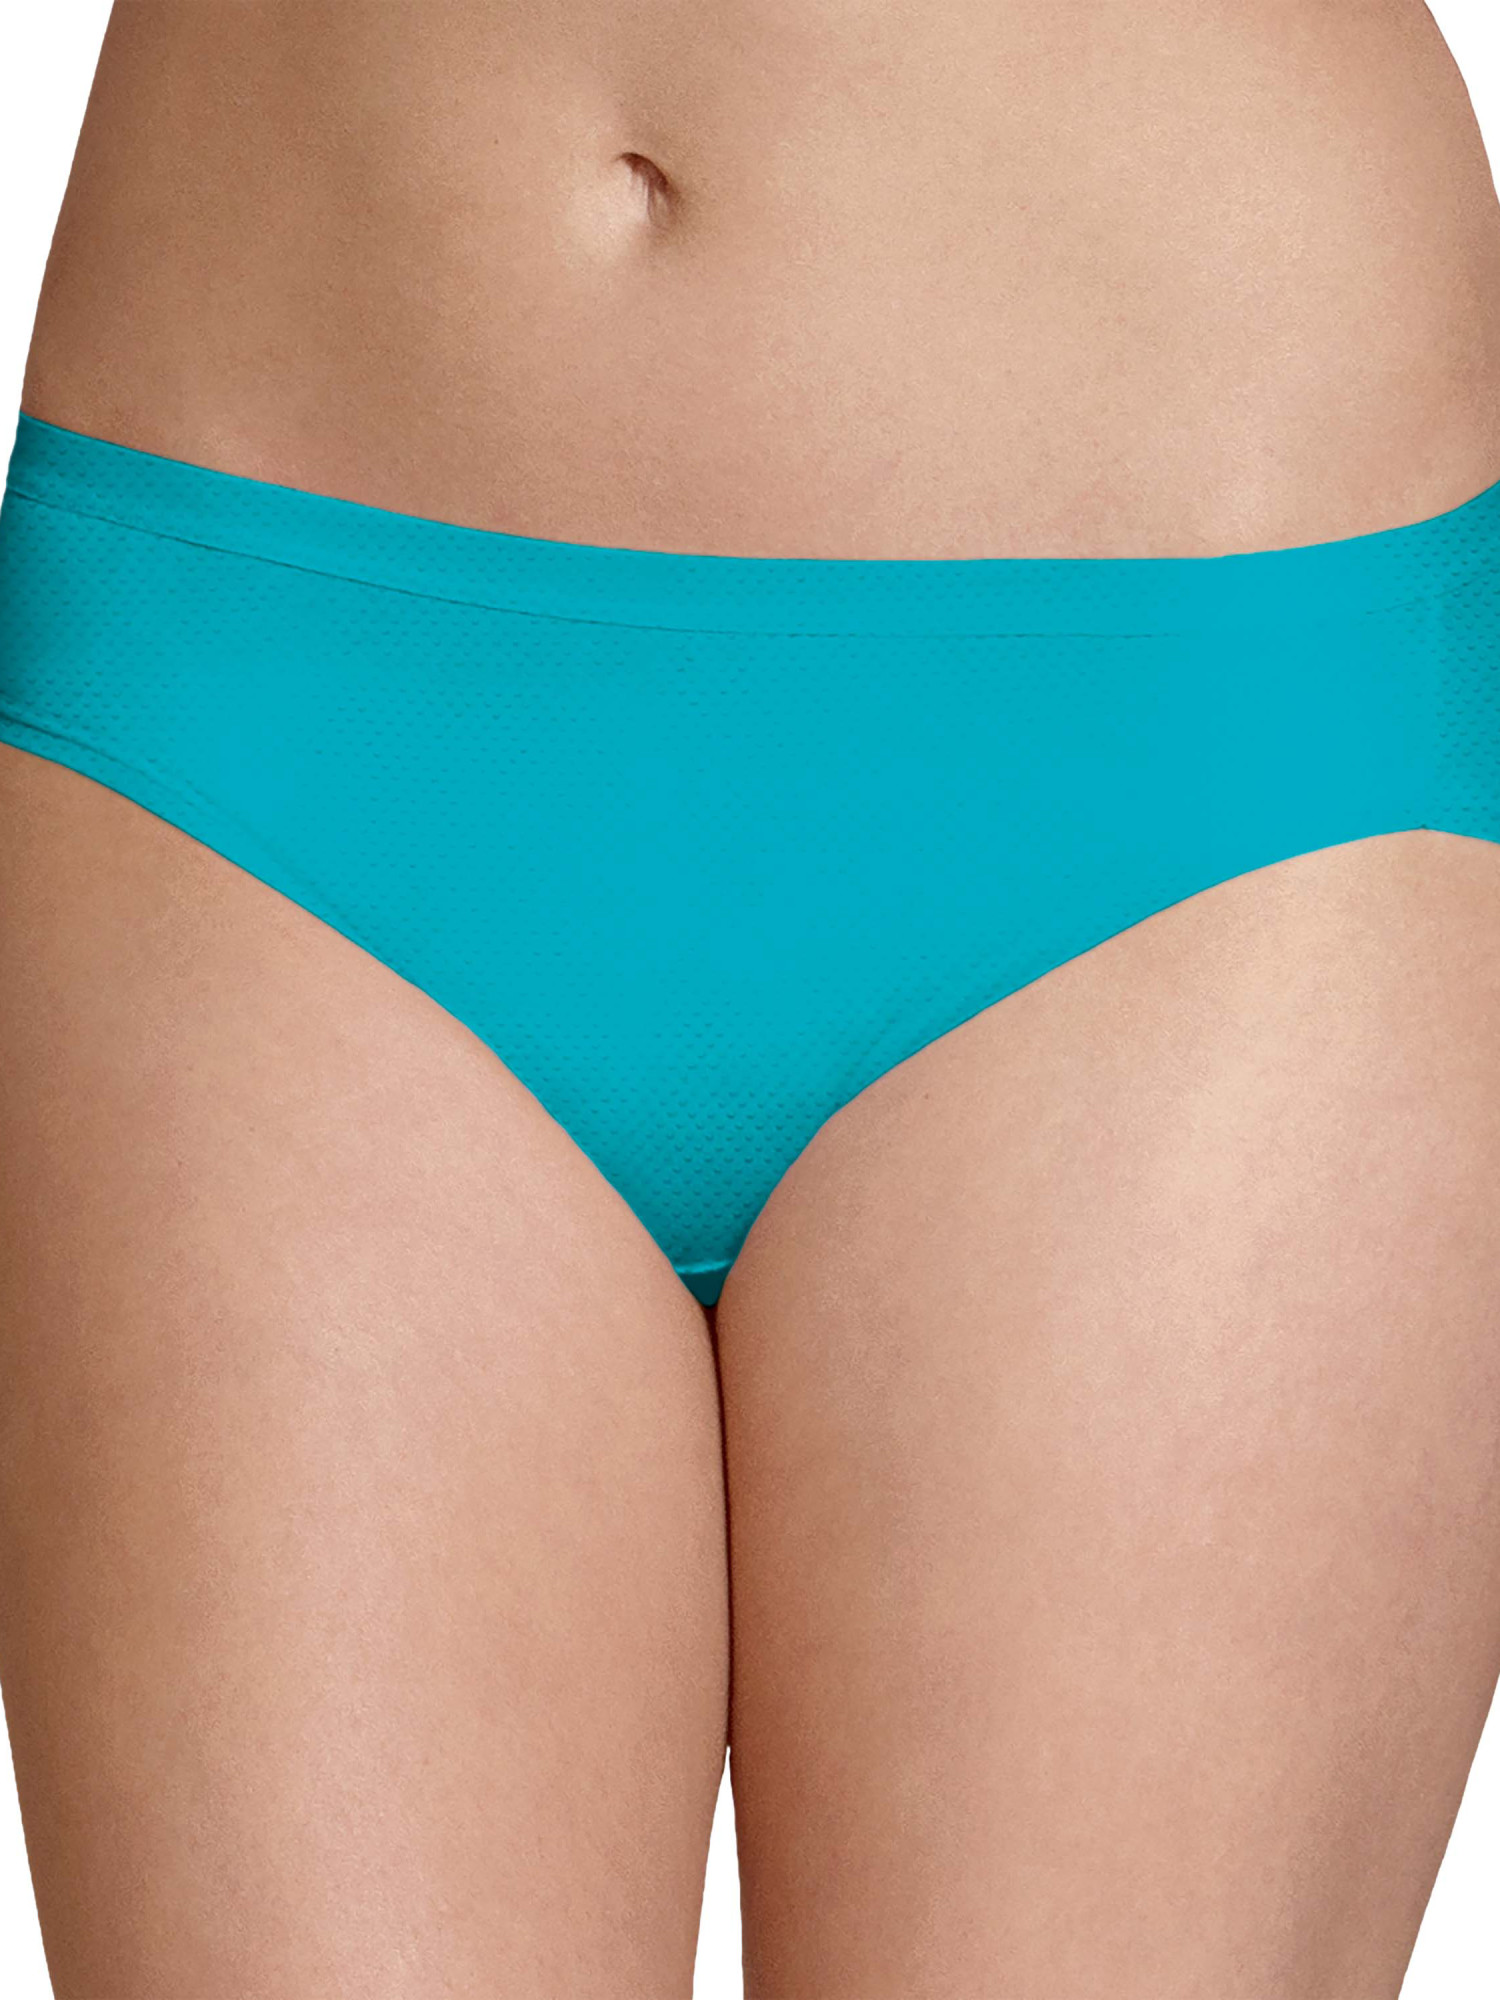 538f95595faf Fruit of the Loom - Women's Breathable Micro-Mesh Bikini Panties - 4 Pack -  Walmart.com